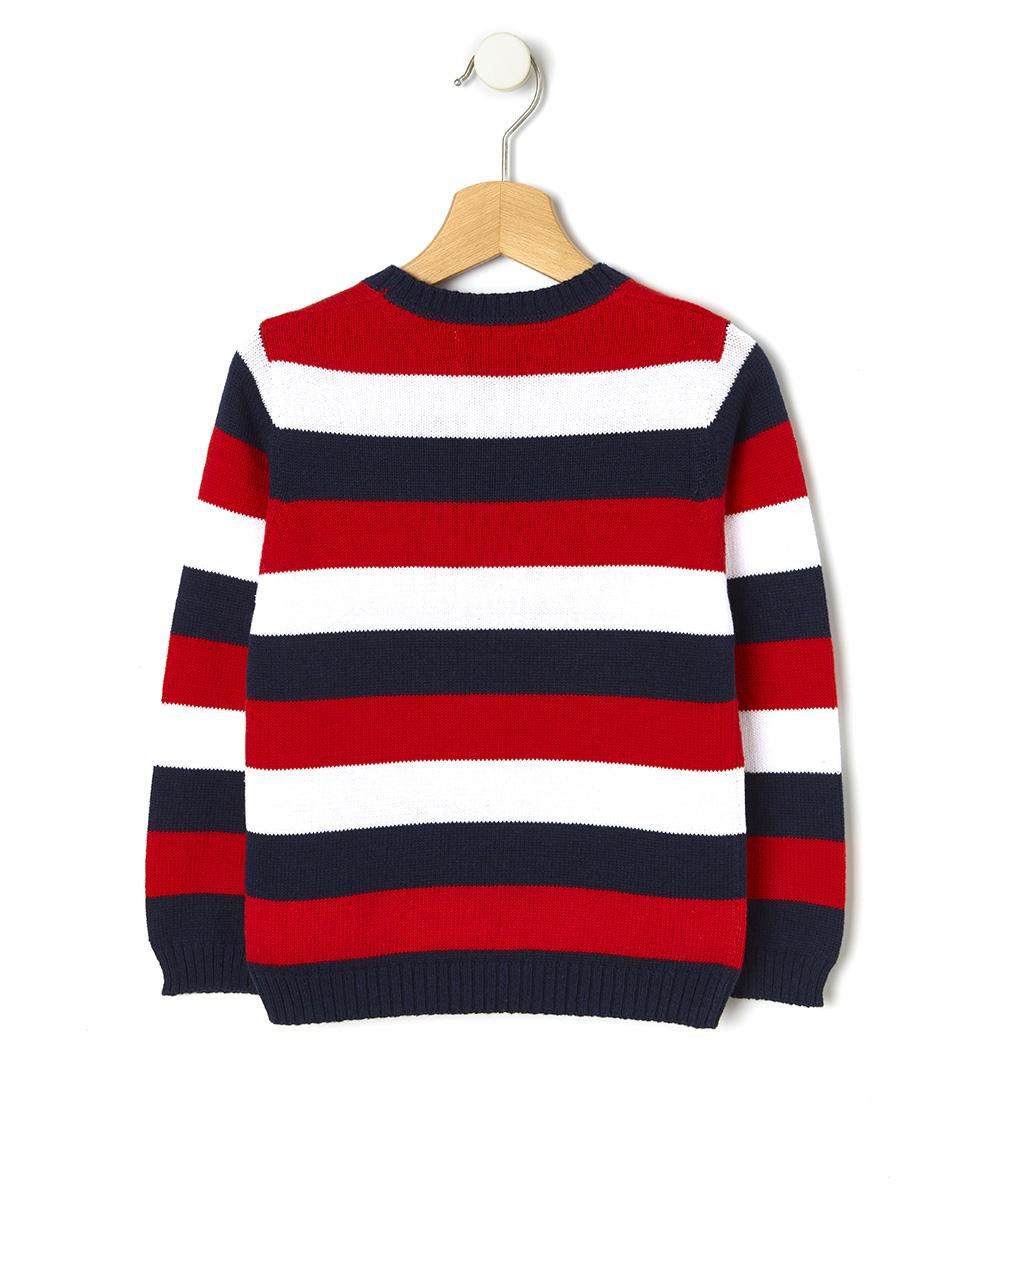 Maglia tricot basica a righe - Prénatal